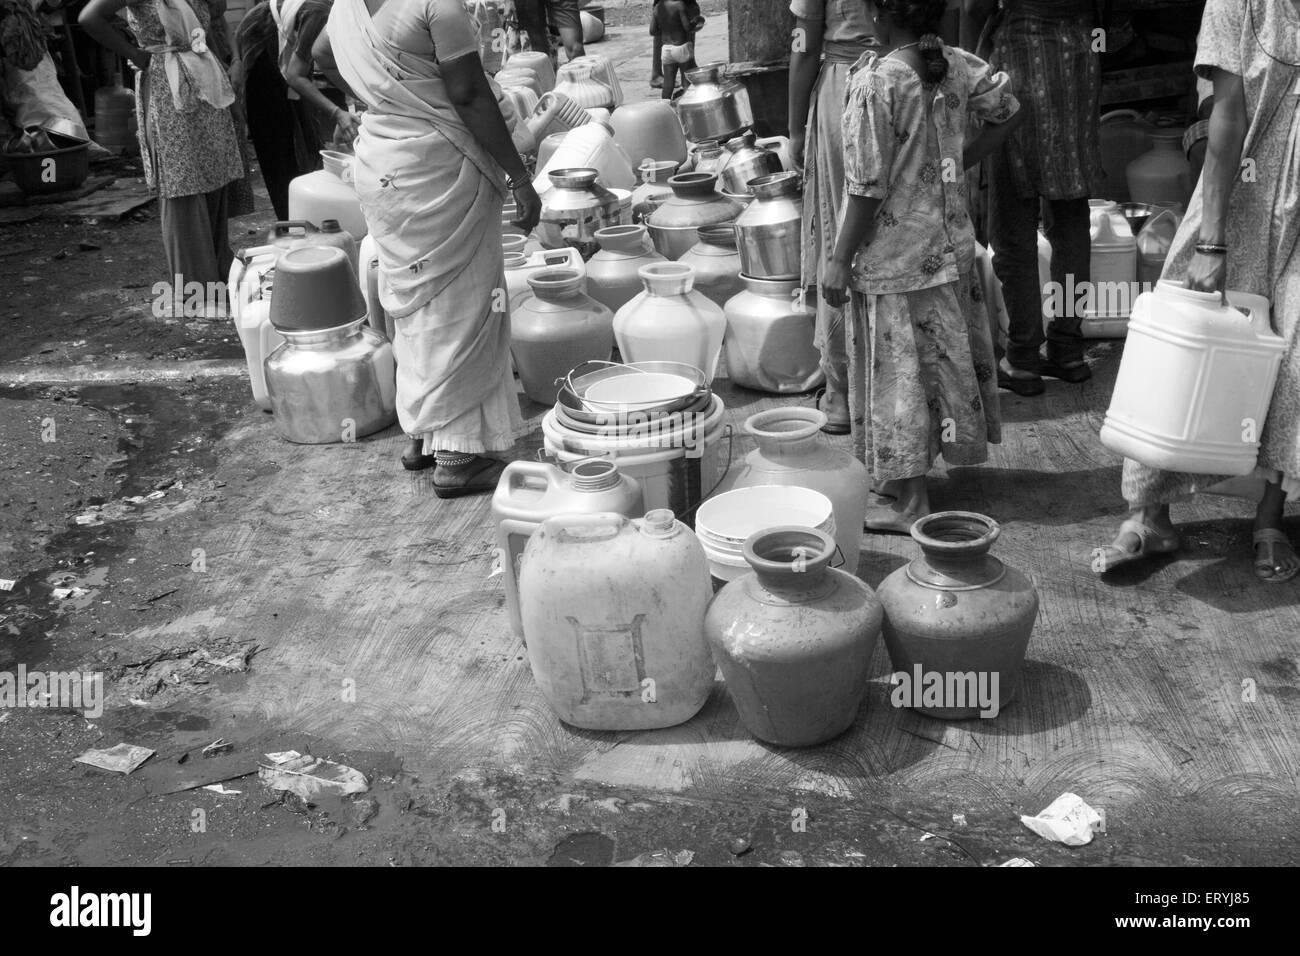 Queue pour l'eau dans des taudis; Mahim; Bombay Mumbai Maharashtra; Inde; Photo Stock